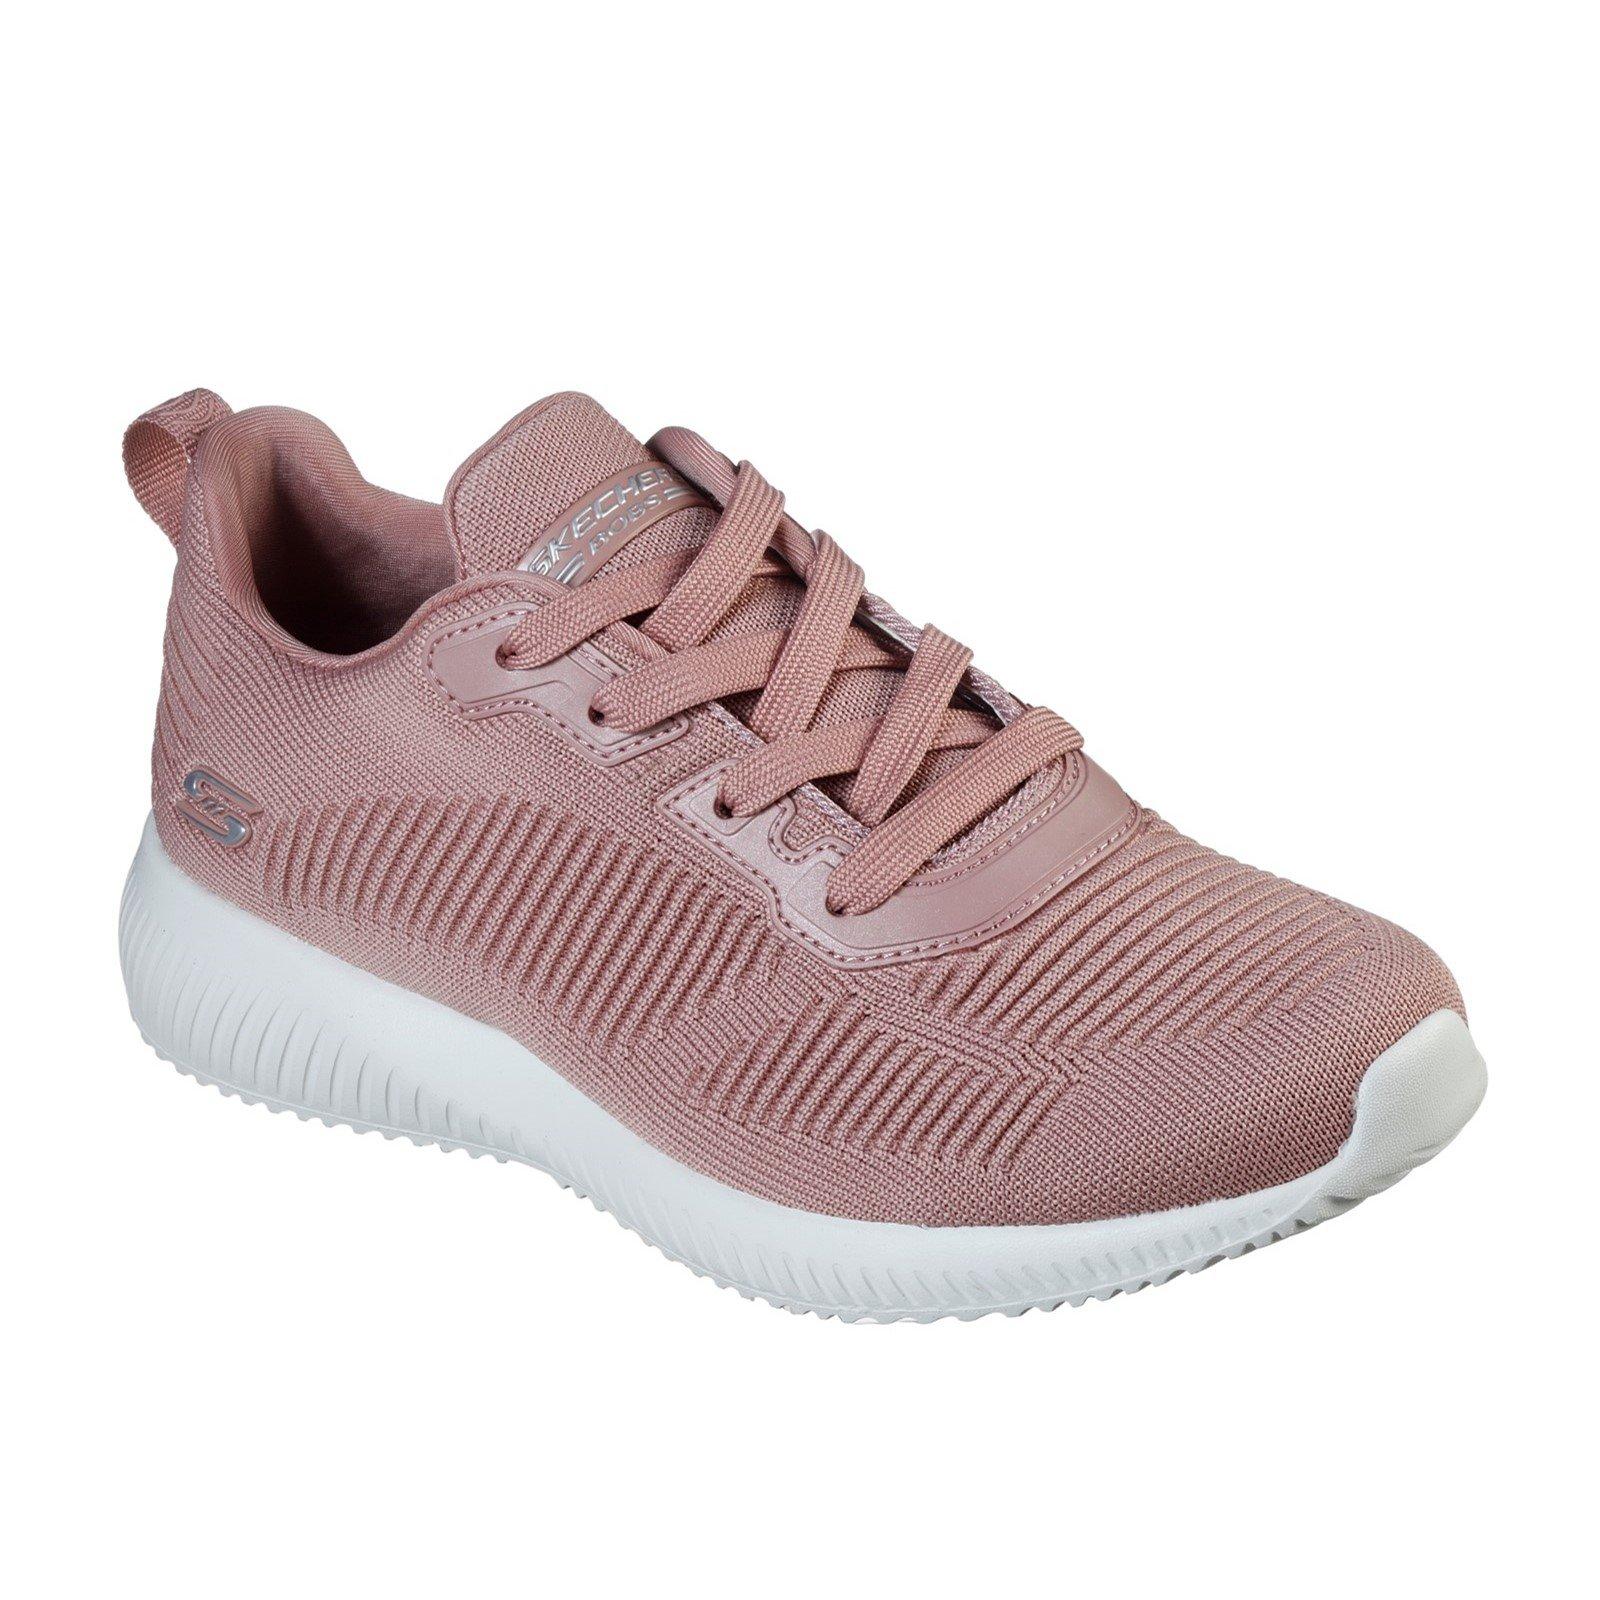 Skechers Women's Bobs Squad Tough Talk Wide Trainer Various Colours 33062 - Pink 7